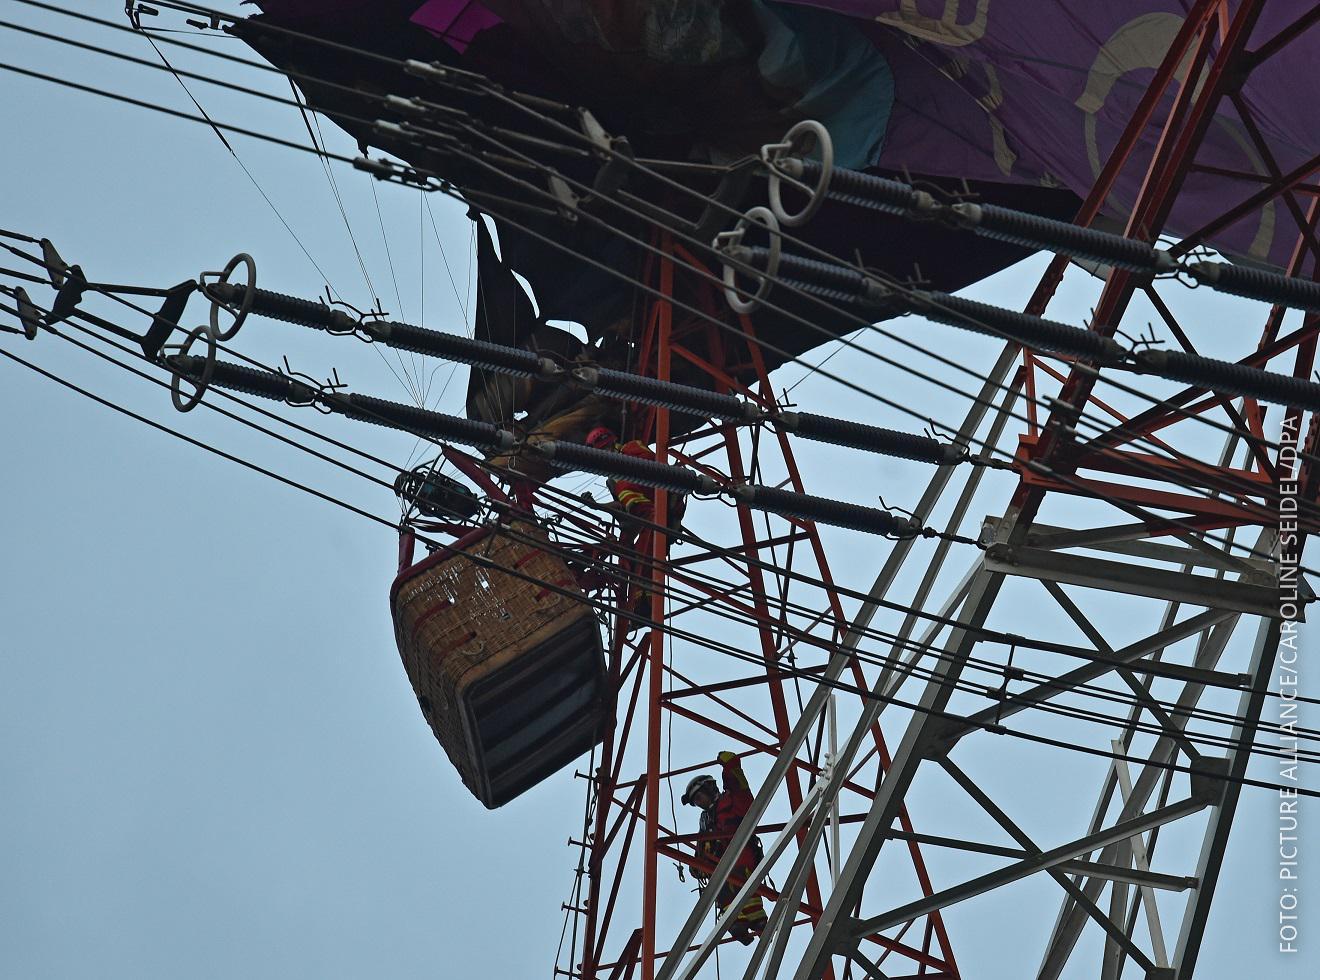 Heißluftballon hängt in Strommast bei Bottrop fest